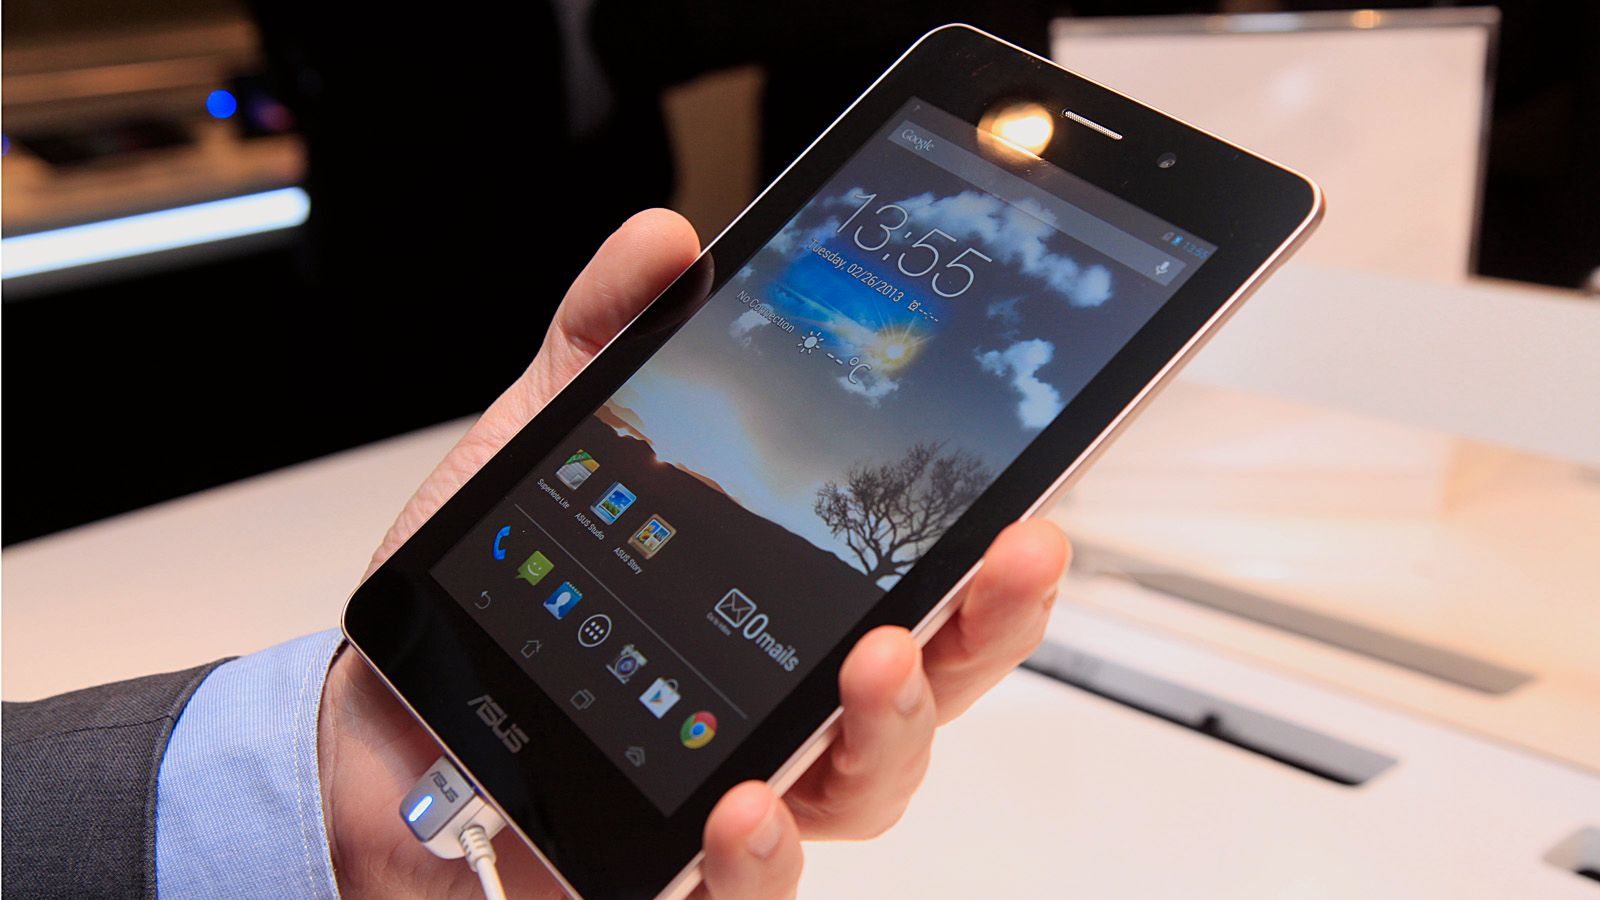 Asus Fonepad er på størrelse med Google Nexus 7.Foto: Kurt Lekanger, Amobil.no